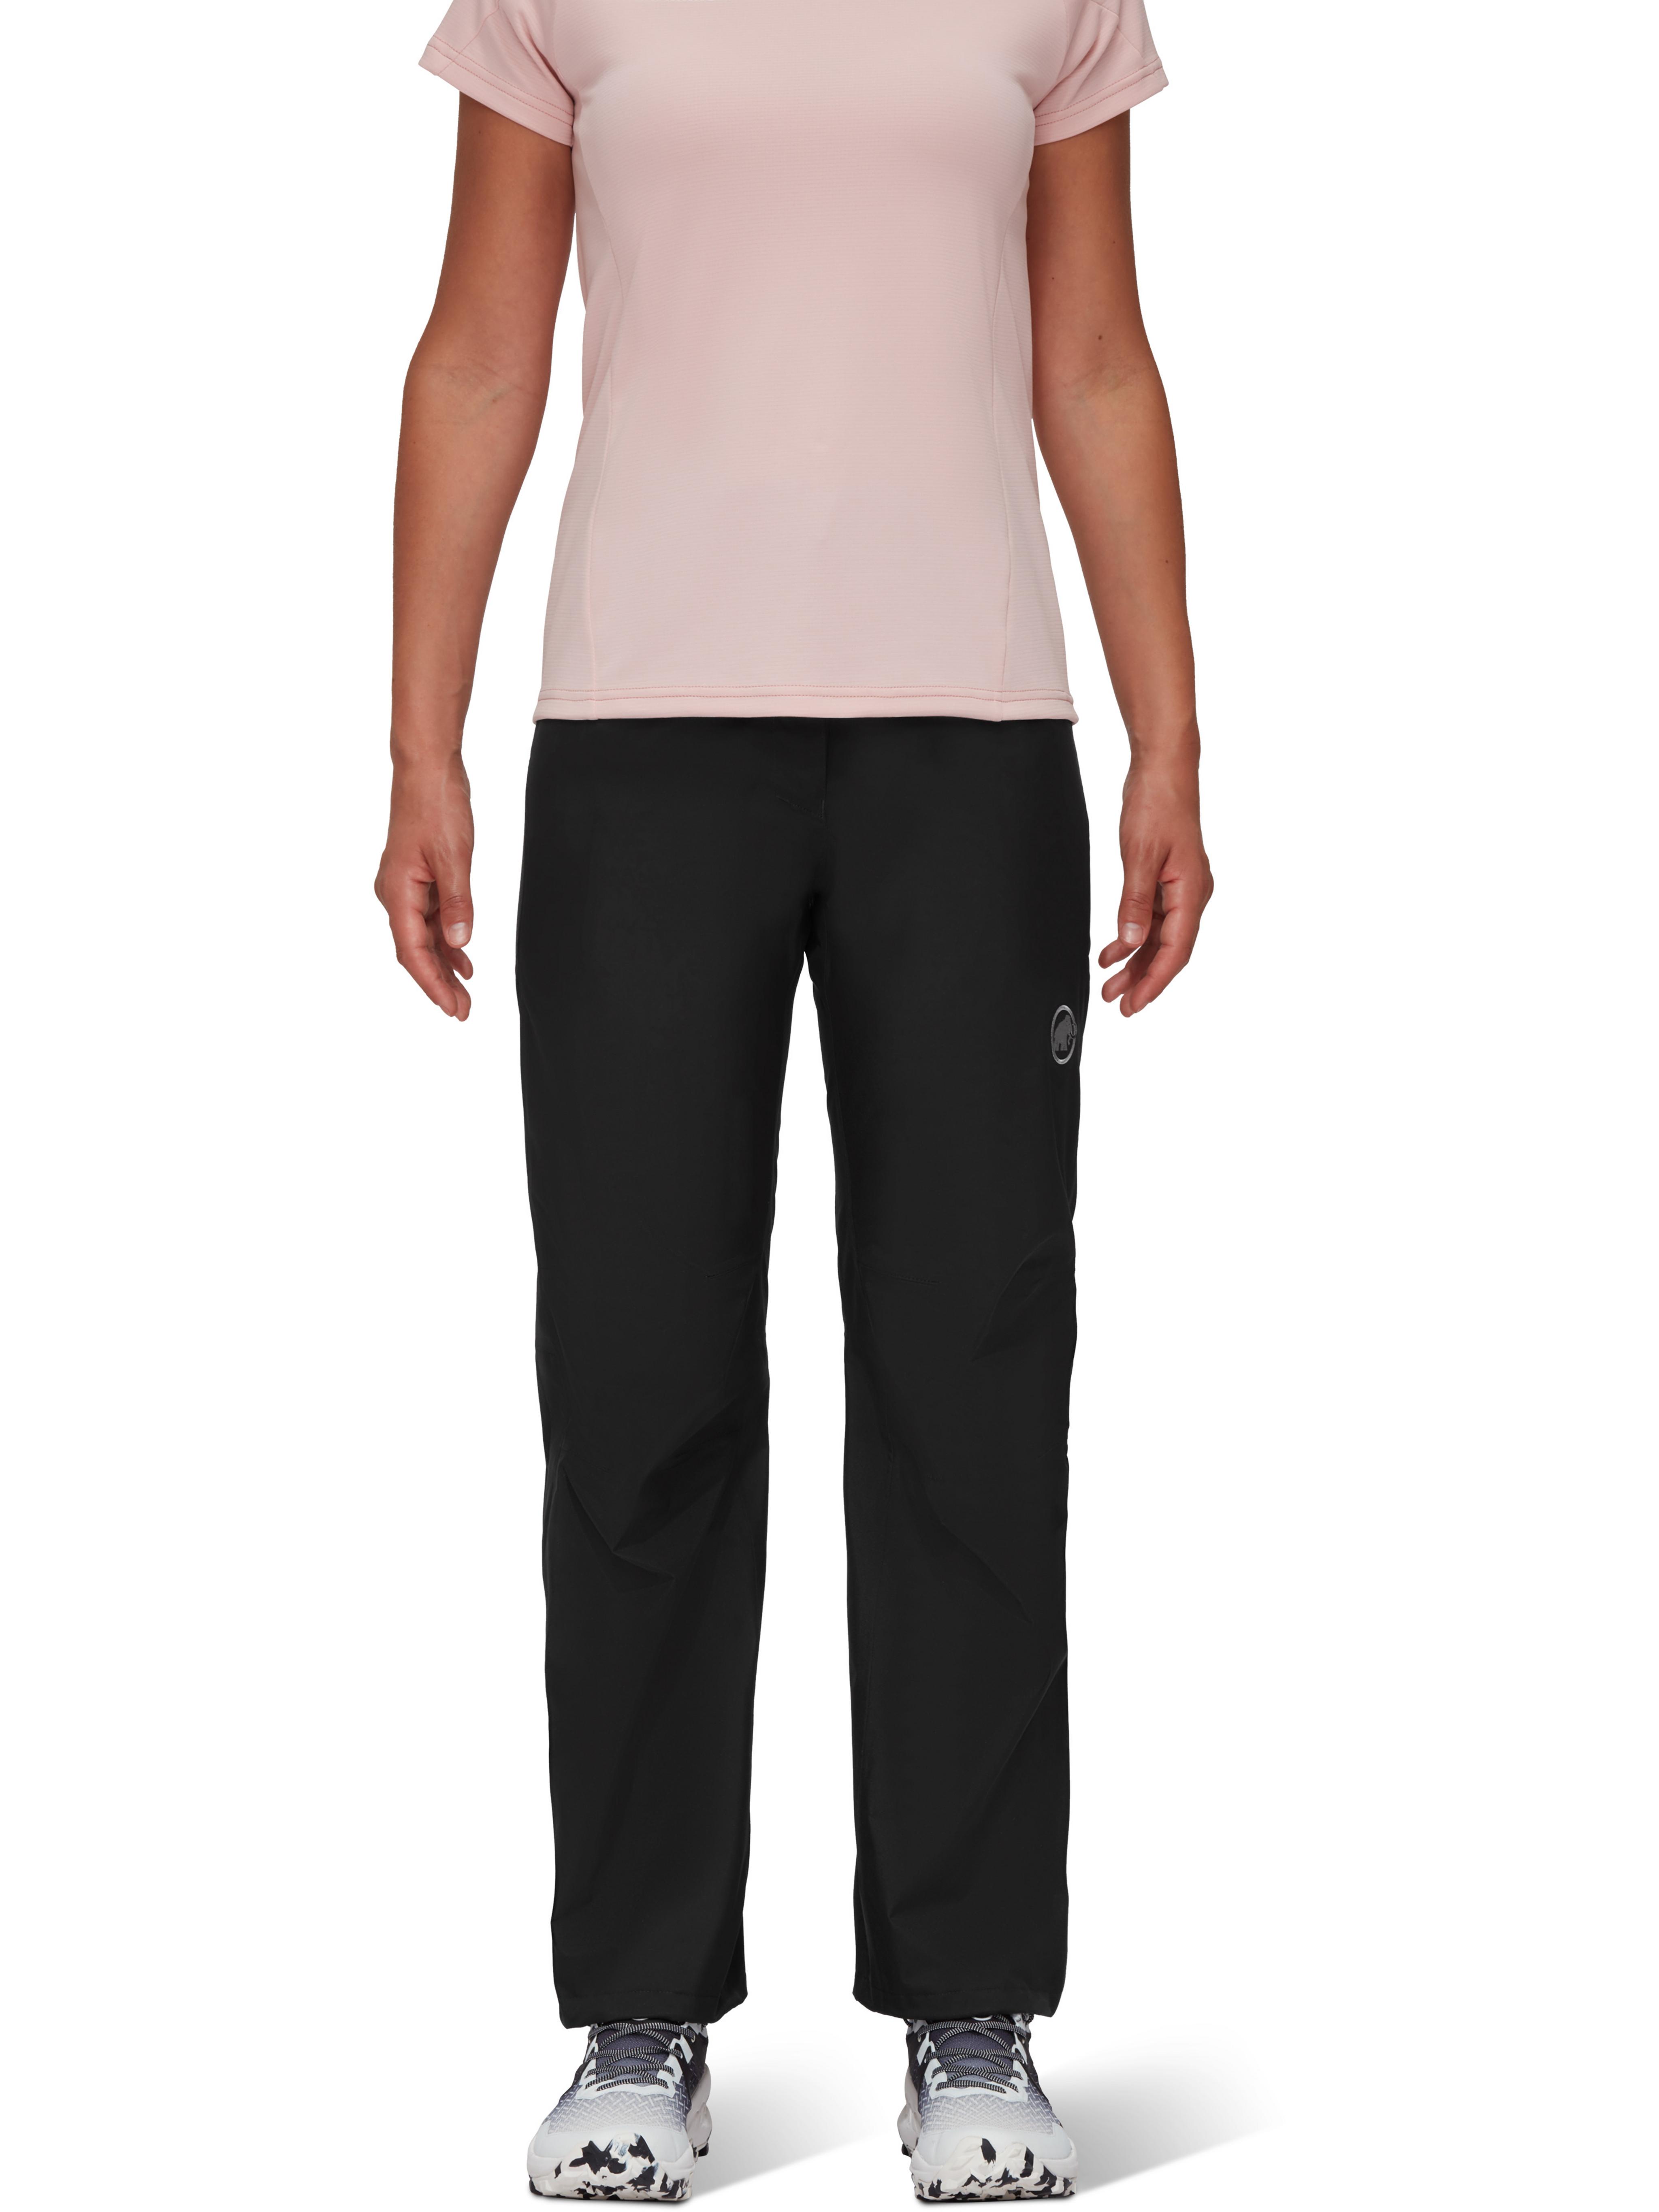 Albula HS Pants Women product image